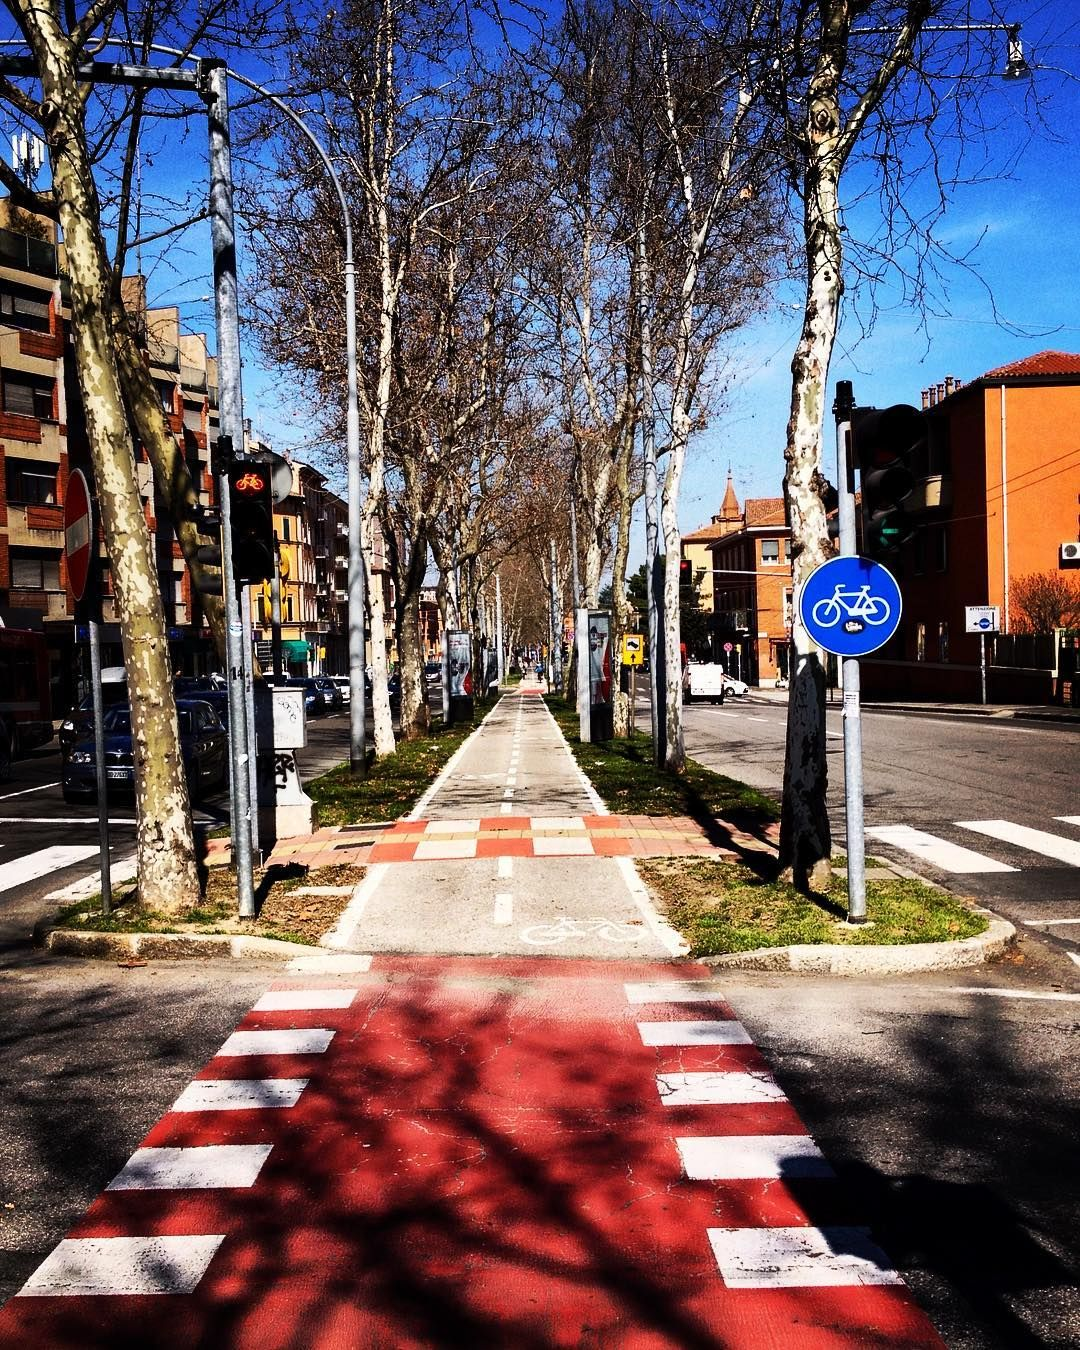 #tangenzialebiciclette #instaitalia #igersitalia #igersemiliaromagna #igersbologna #turismoer #ig_emiliaromagna #ig_bologna #iosonogeco #twiperbole #facecreativelink #charmingitaly #bologna #vivobologna #vivo_italia #vivoemiliaromagna #bologna_city #italian_city #Fotografoitaliano #volgobologna#loves_bologna #eccbo by wiki23